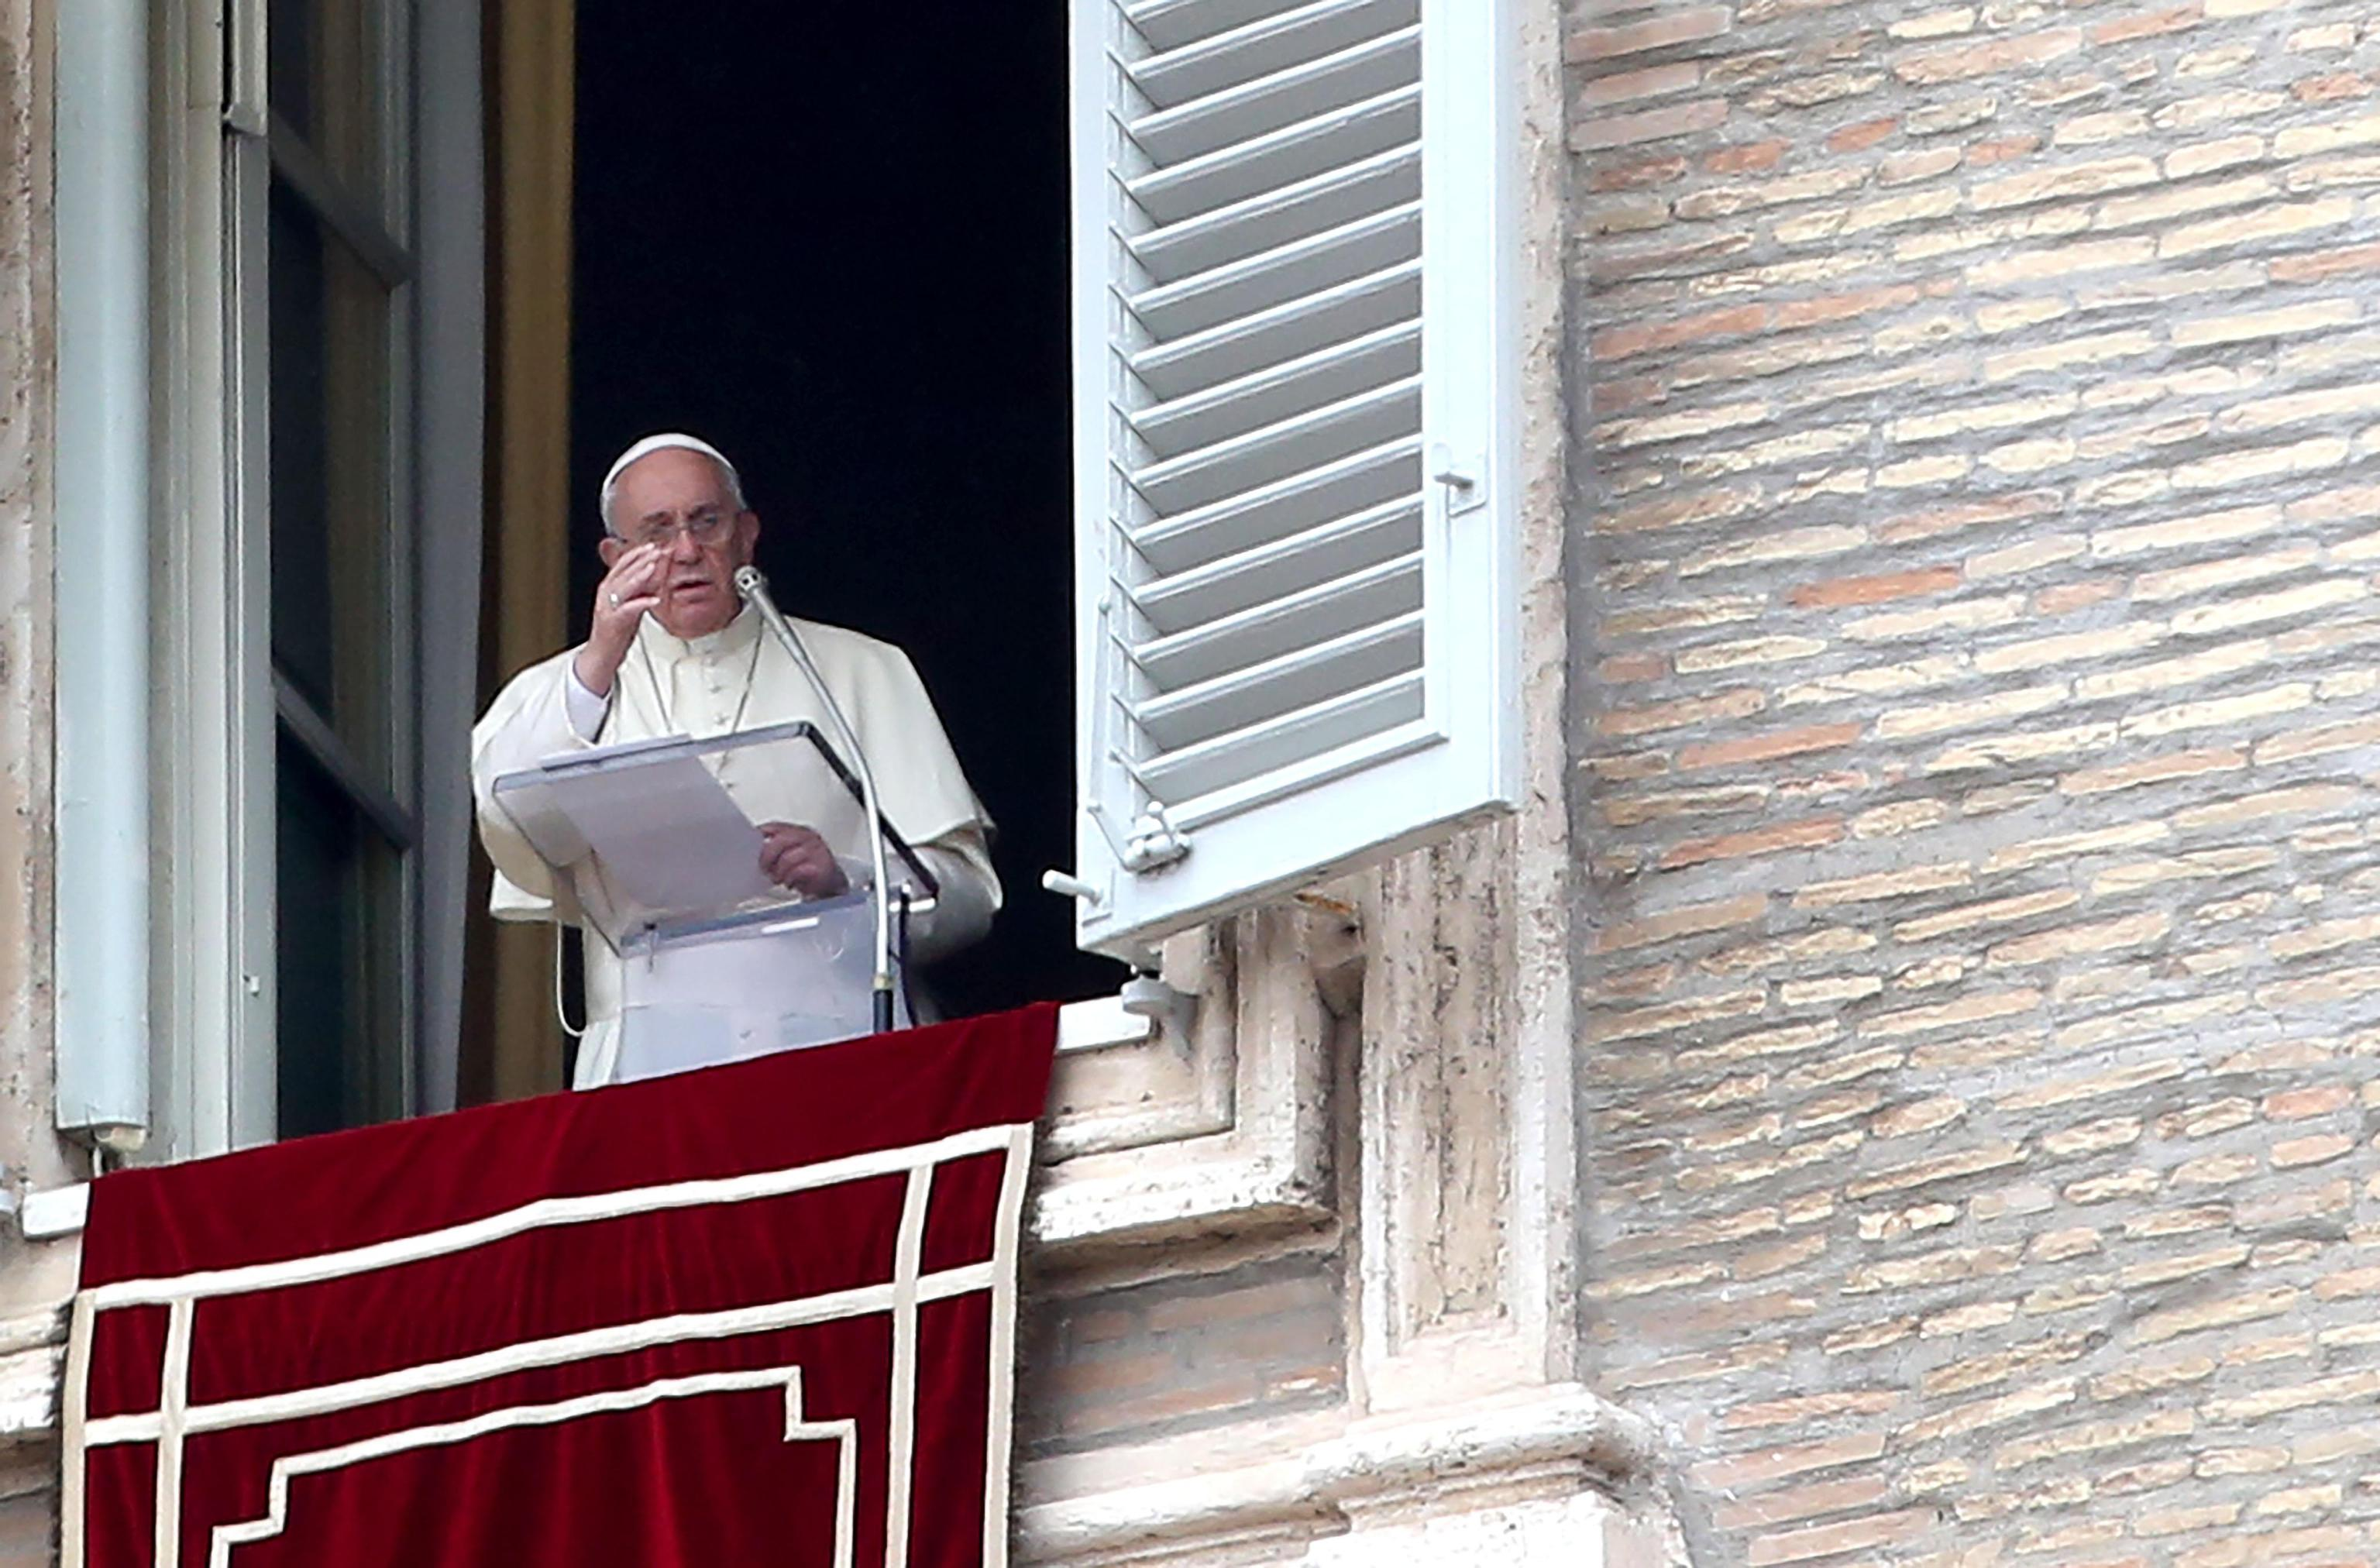 Pope Francis during the Regina Coeli prayer in St. Peter's Square